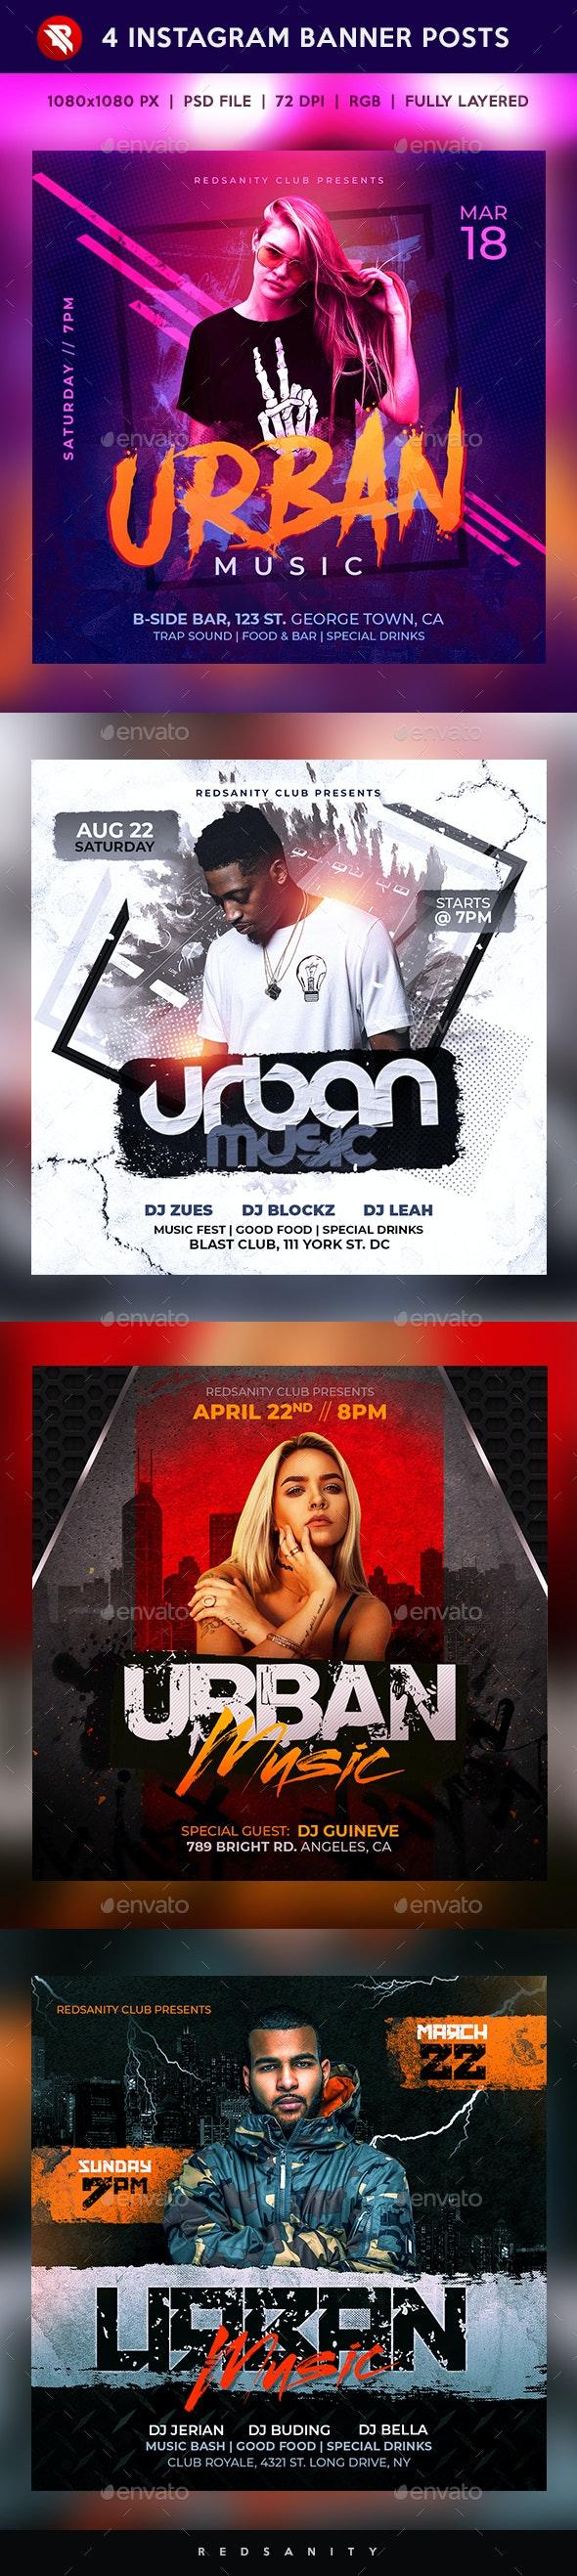 Urban Music Instagram Banner Posts - Social Media Web Elements